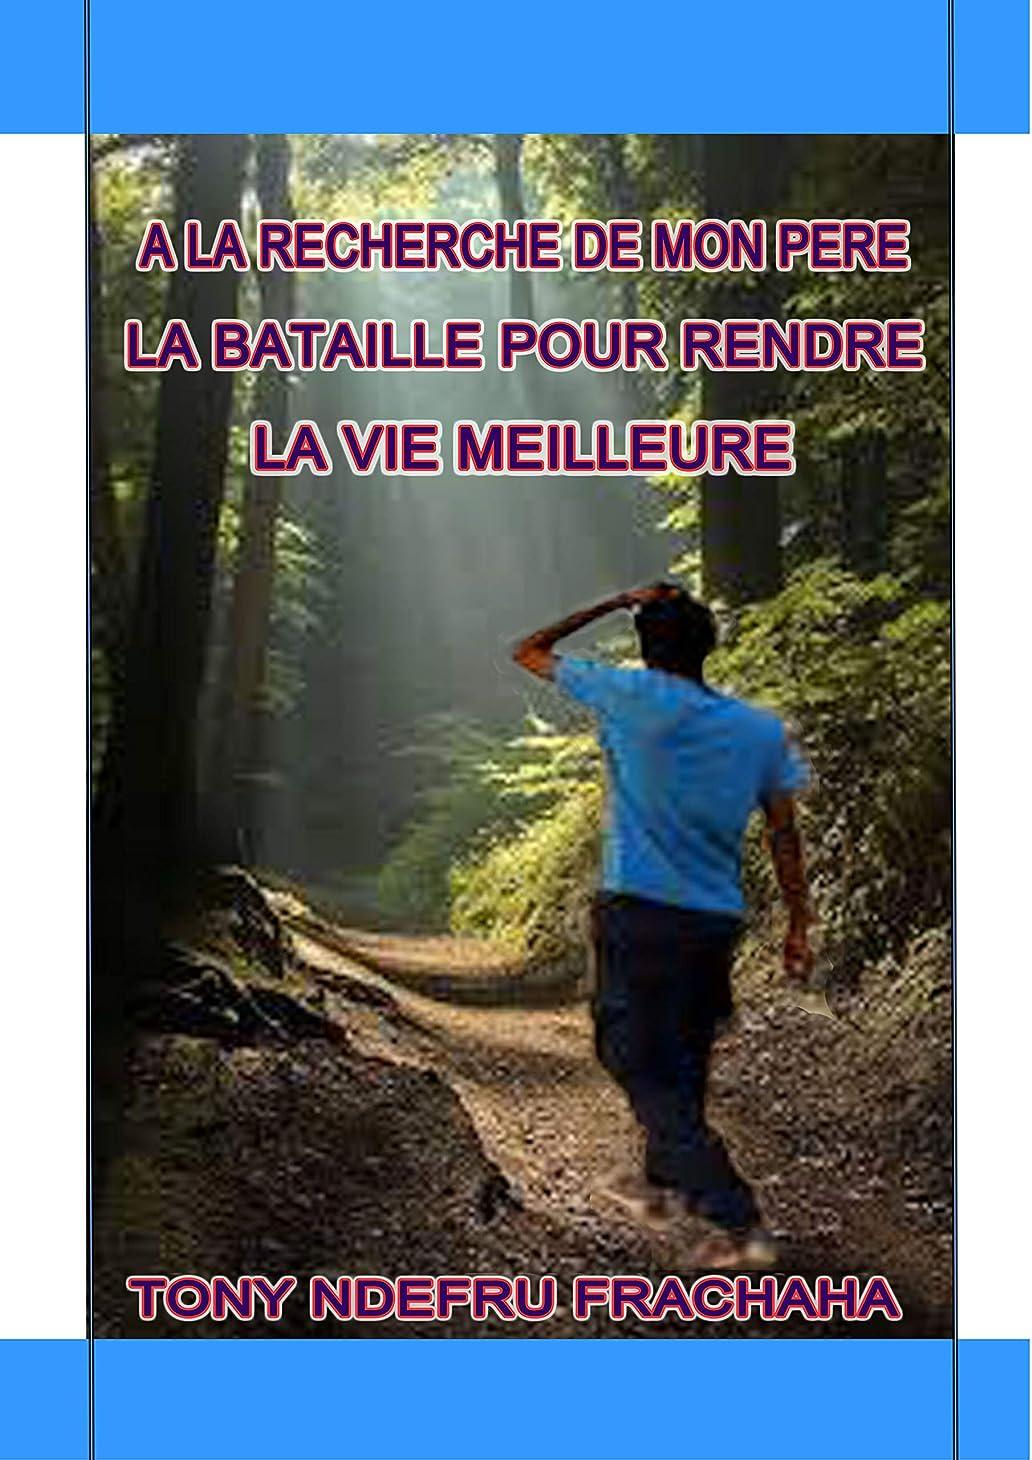 機関車実質的に類人猿A la recherche de mon père, la lutte pour rendre la vie meilleure (French Edition)